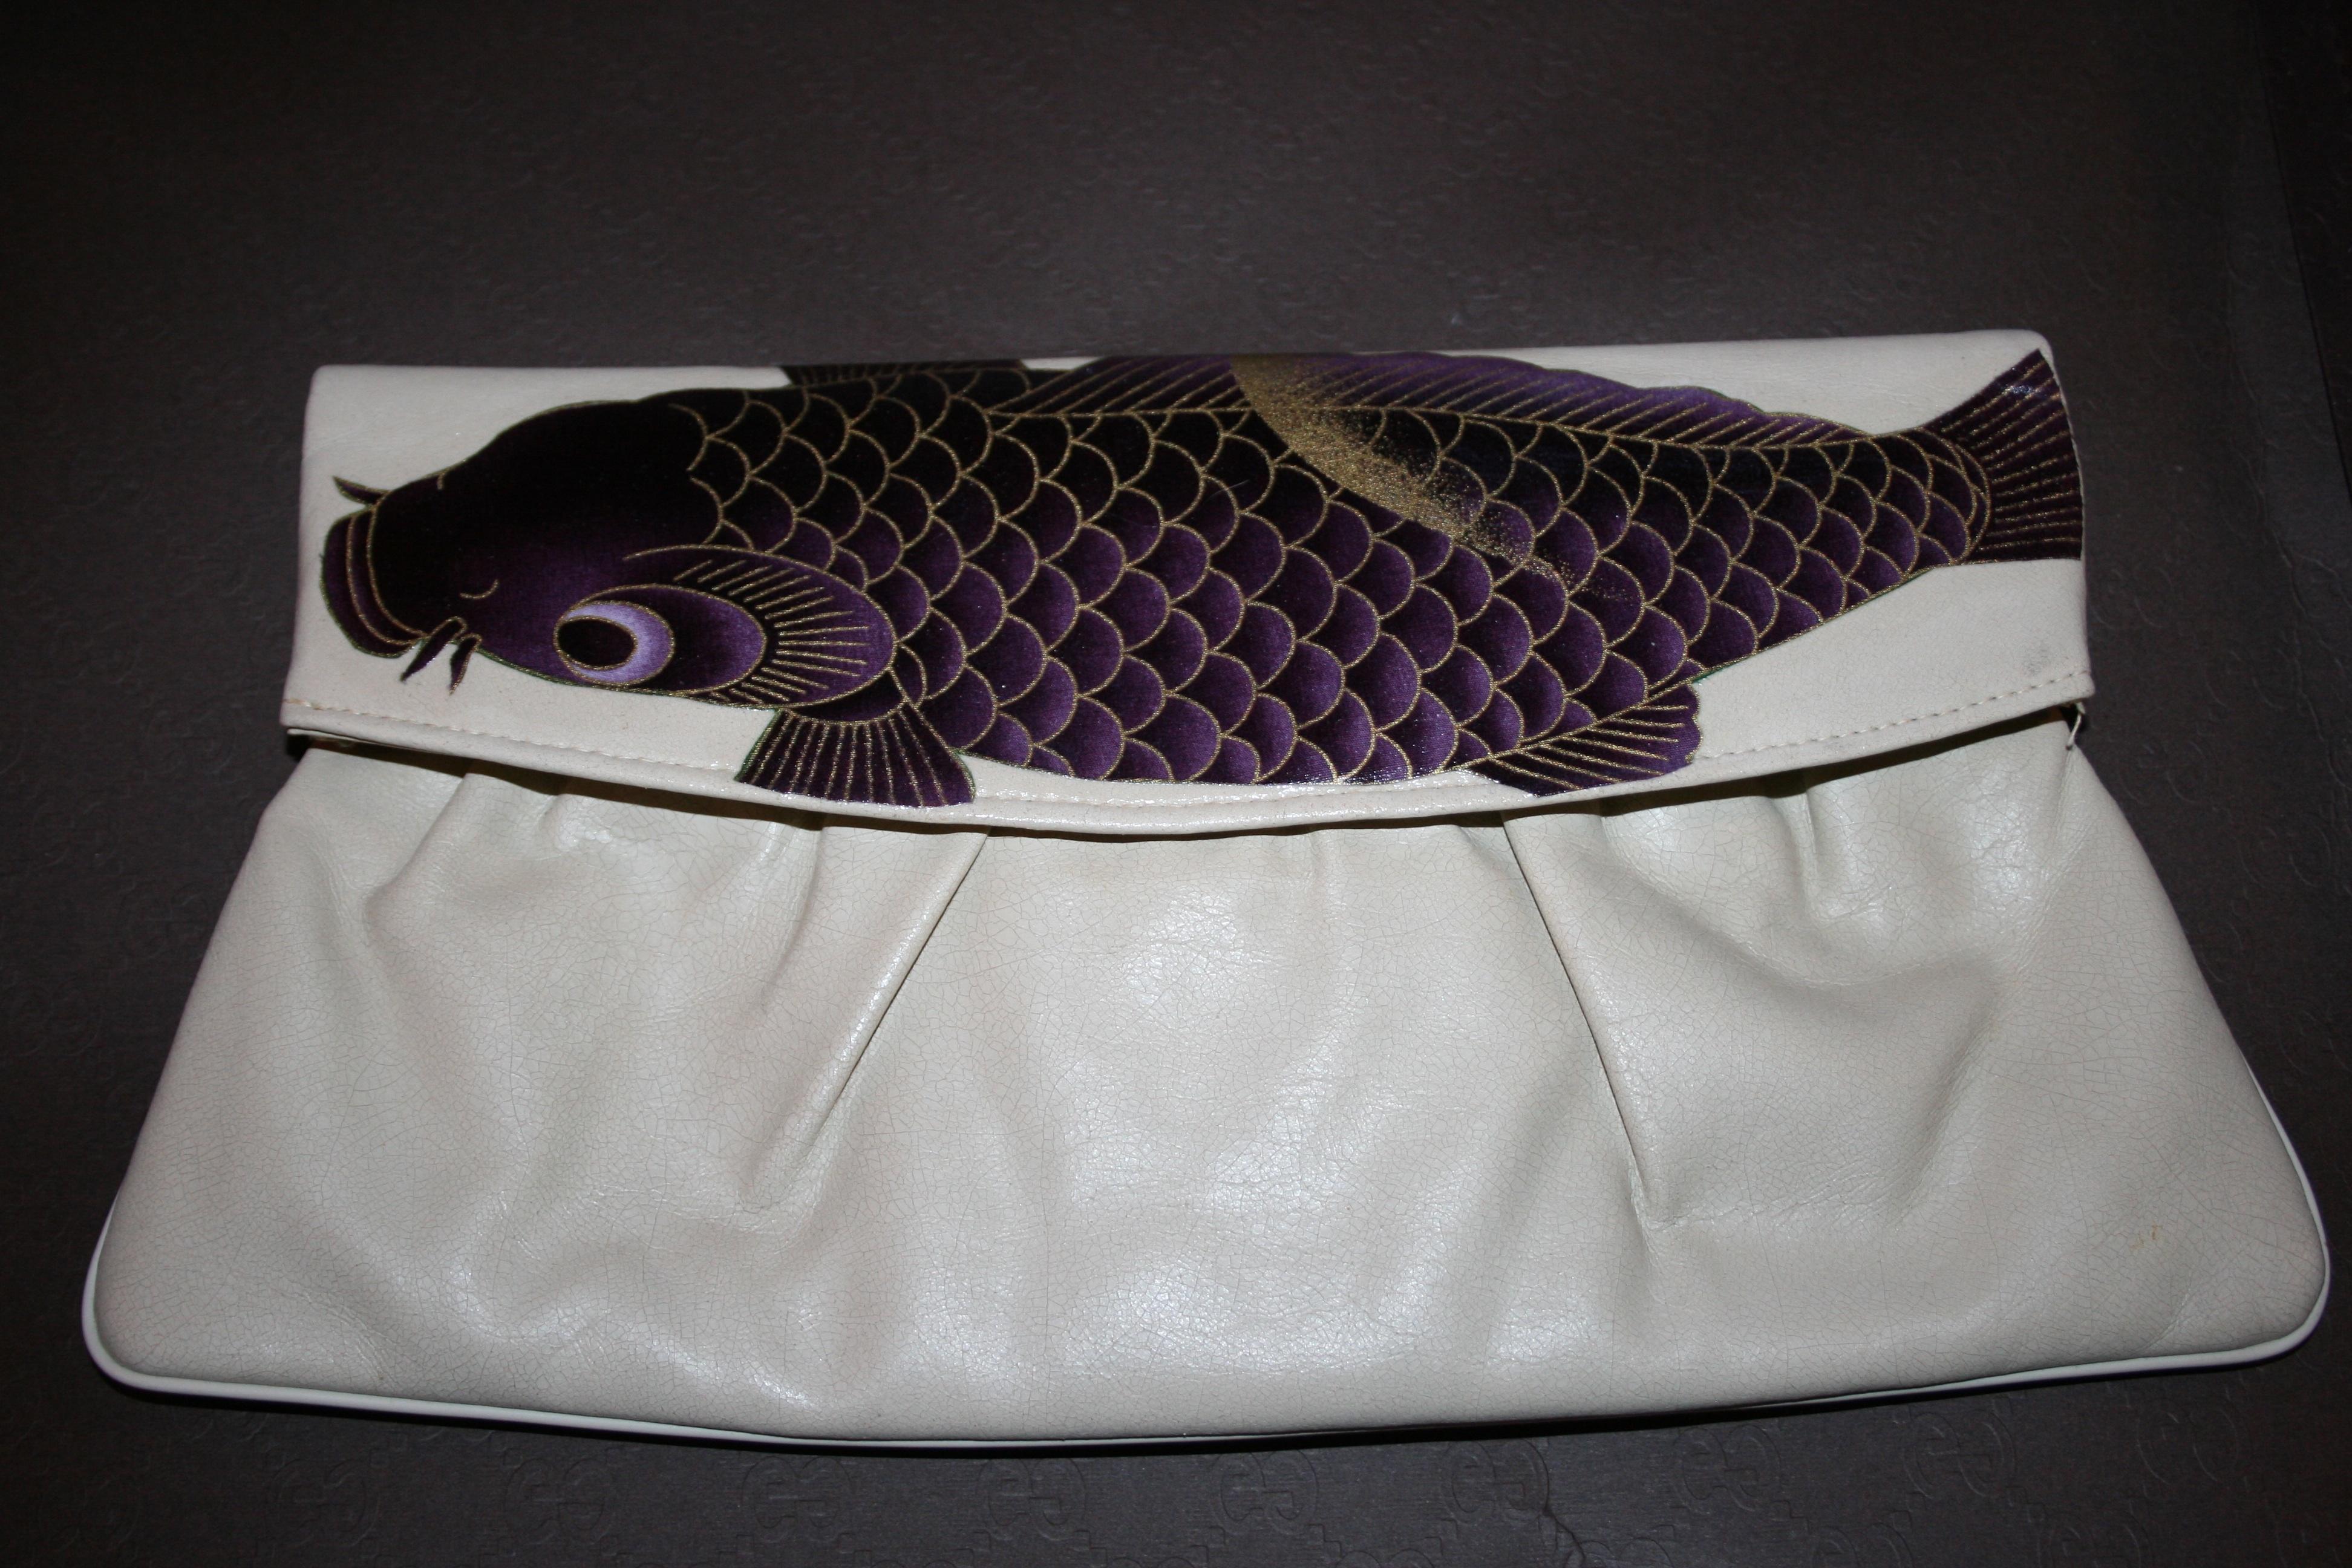 Casa de gitana koi fish vintage purse online store for Koi fish purse